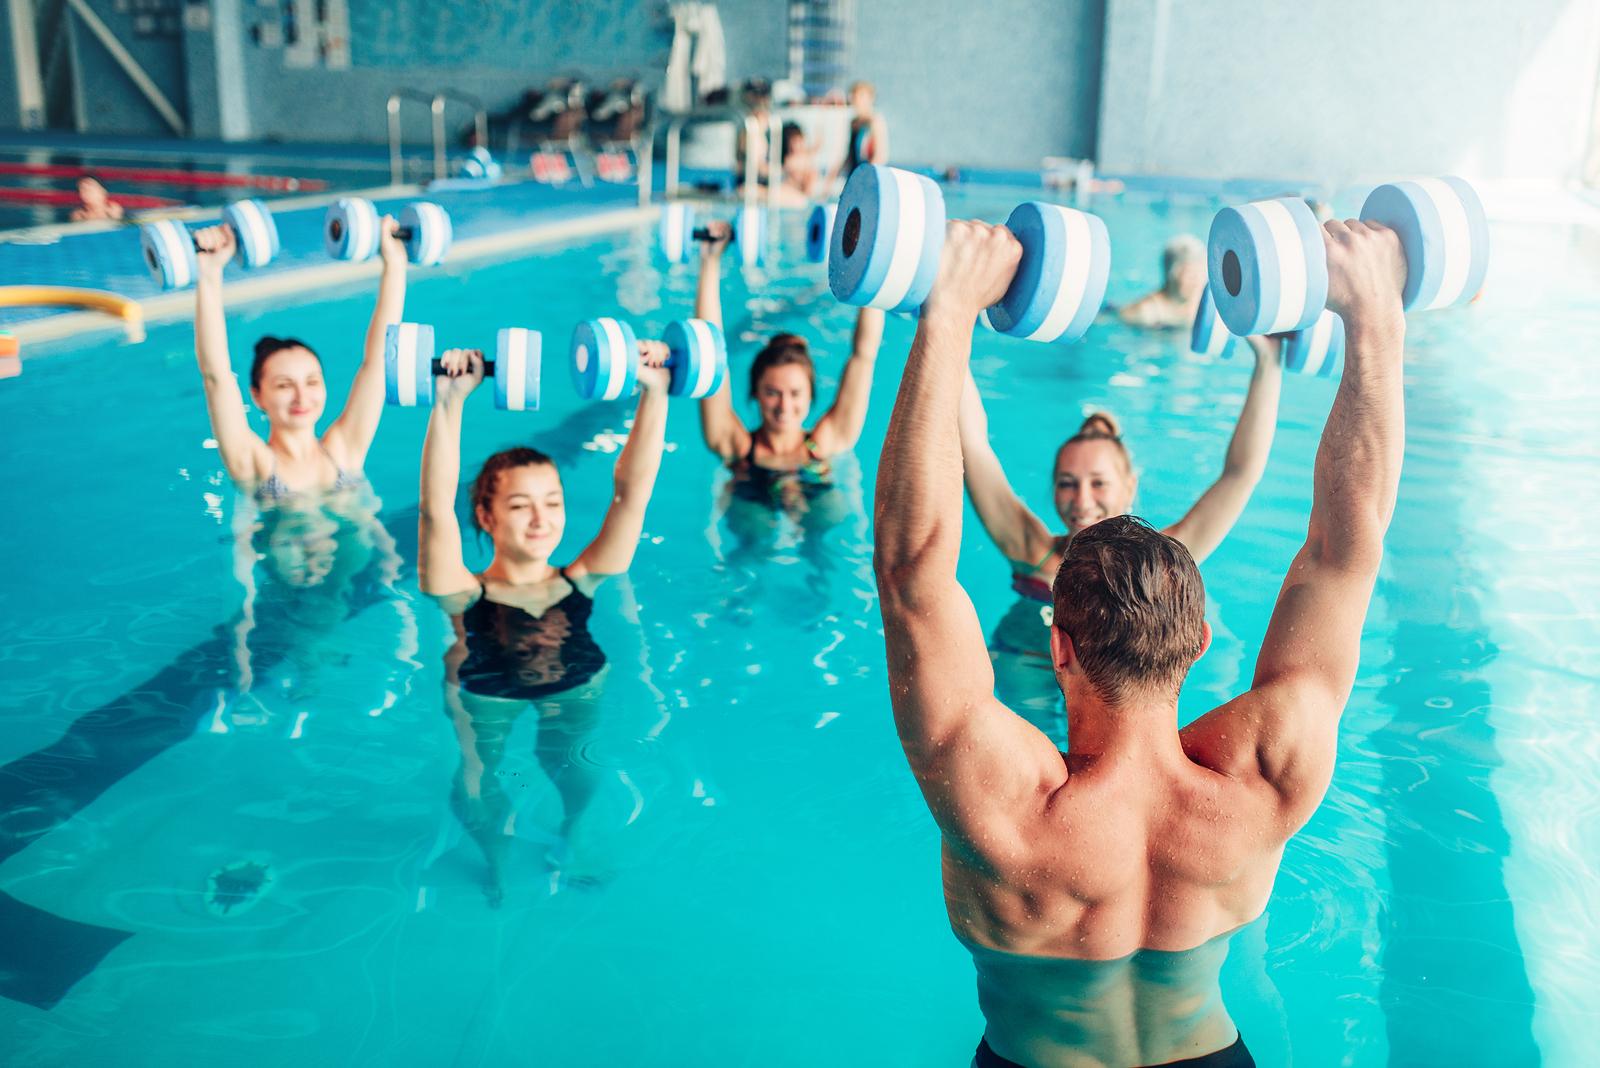 bigstock-Aqua-aerobics-healthy-lifesty-192379789.jpg